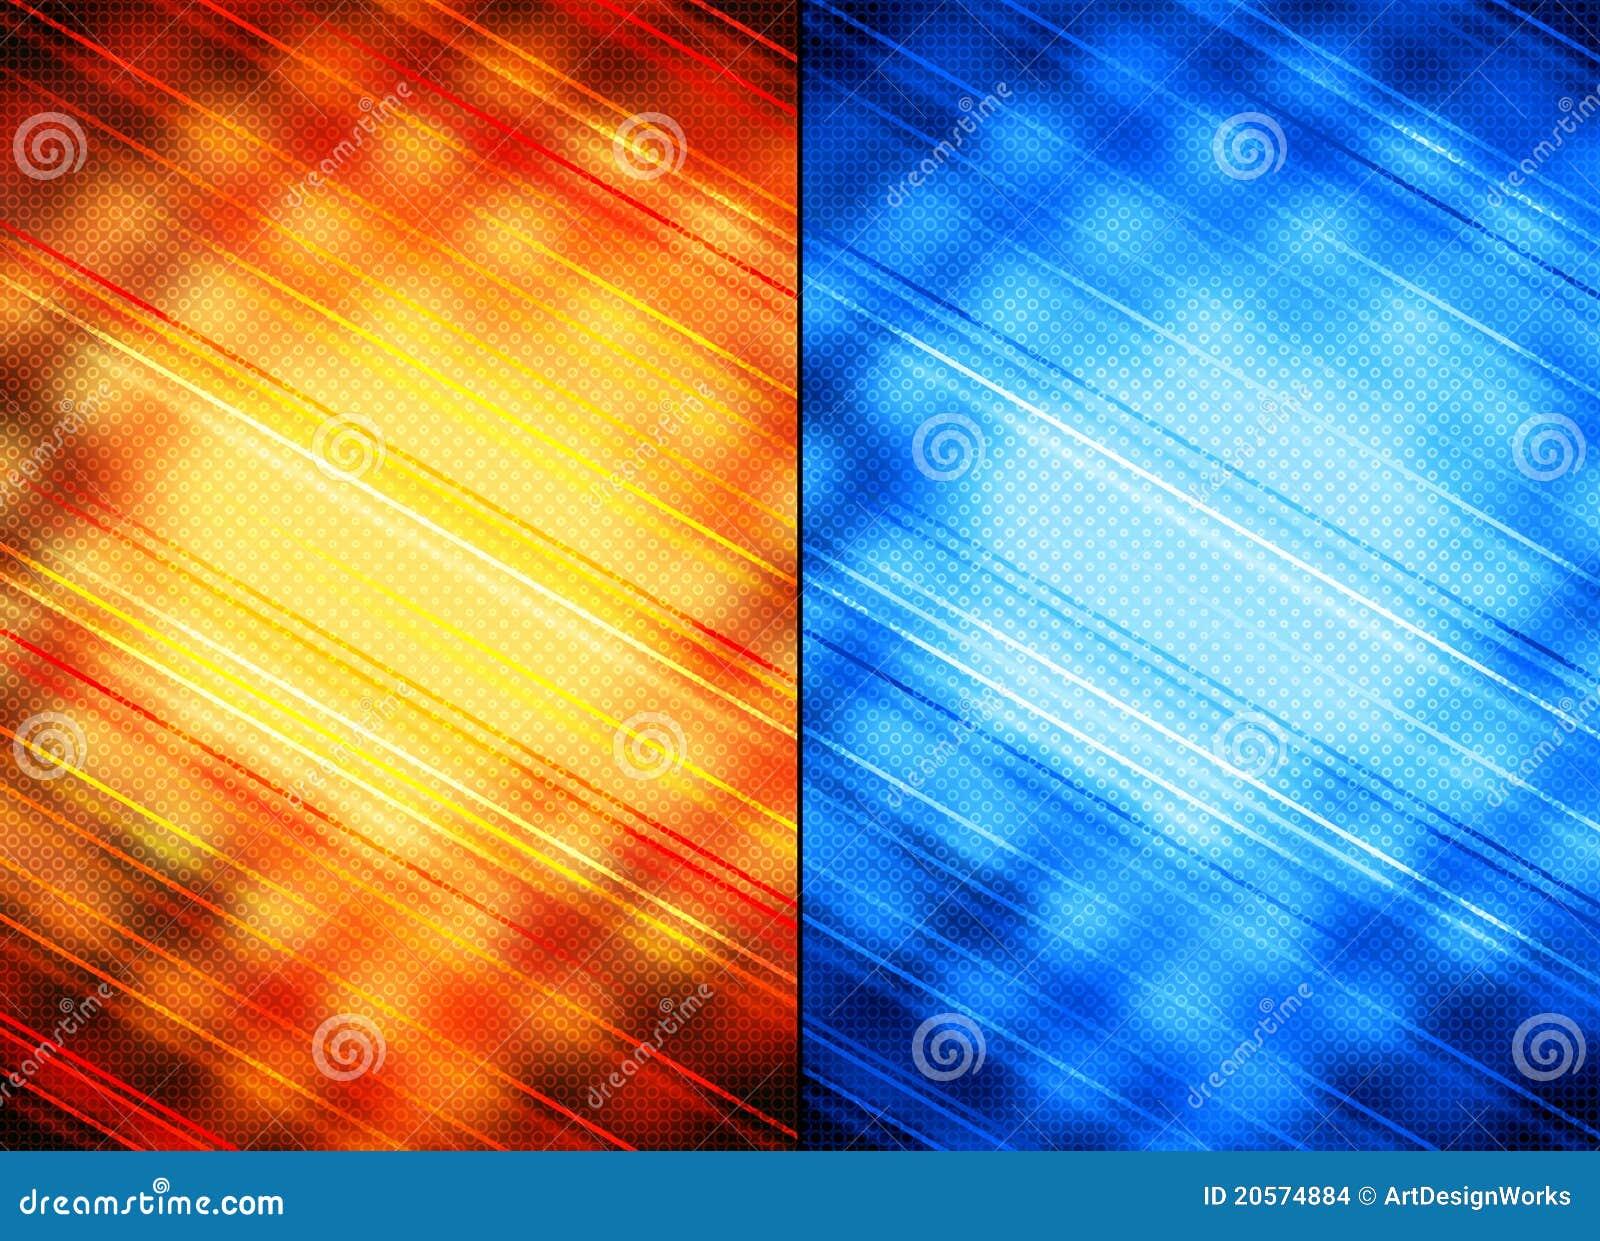 Fundos abstratos alaranjados e azuis